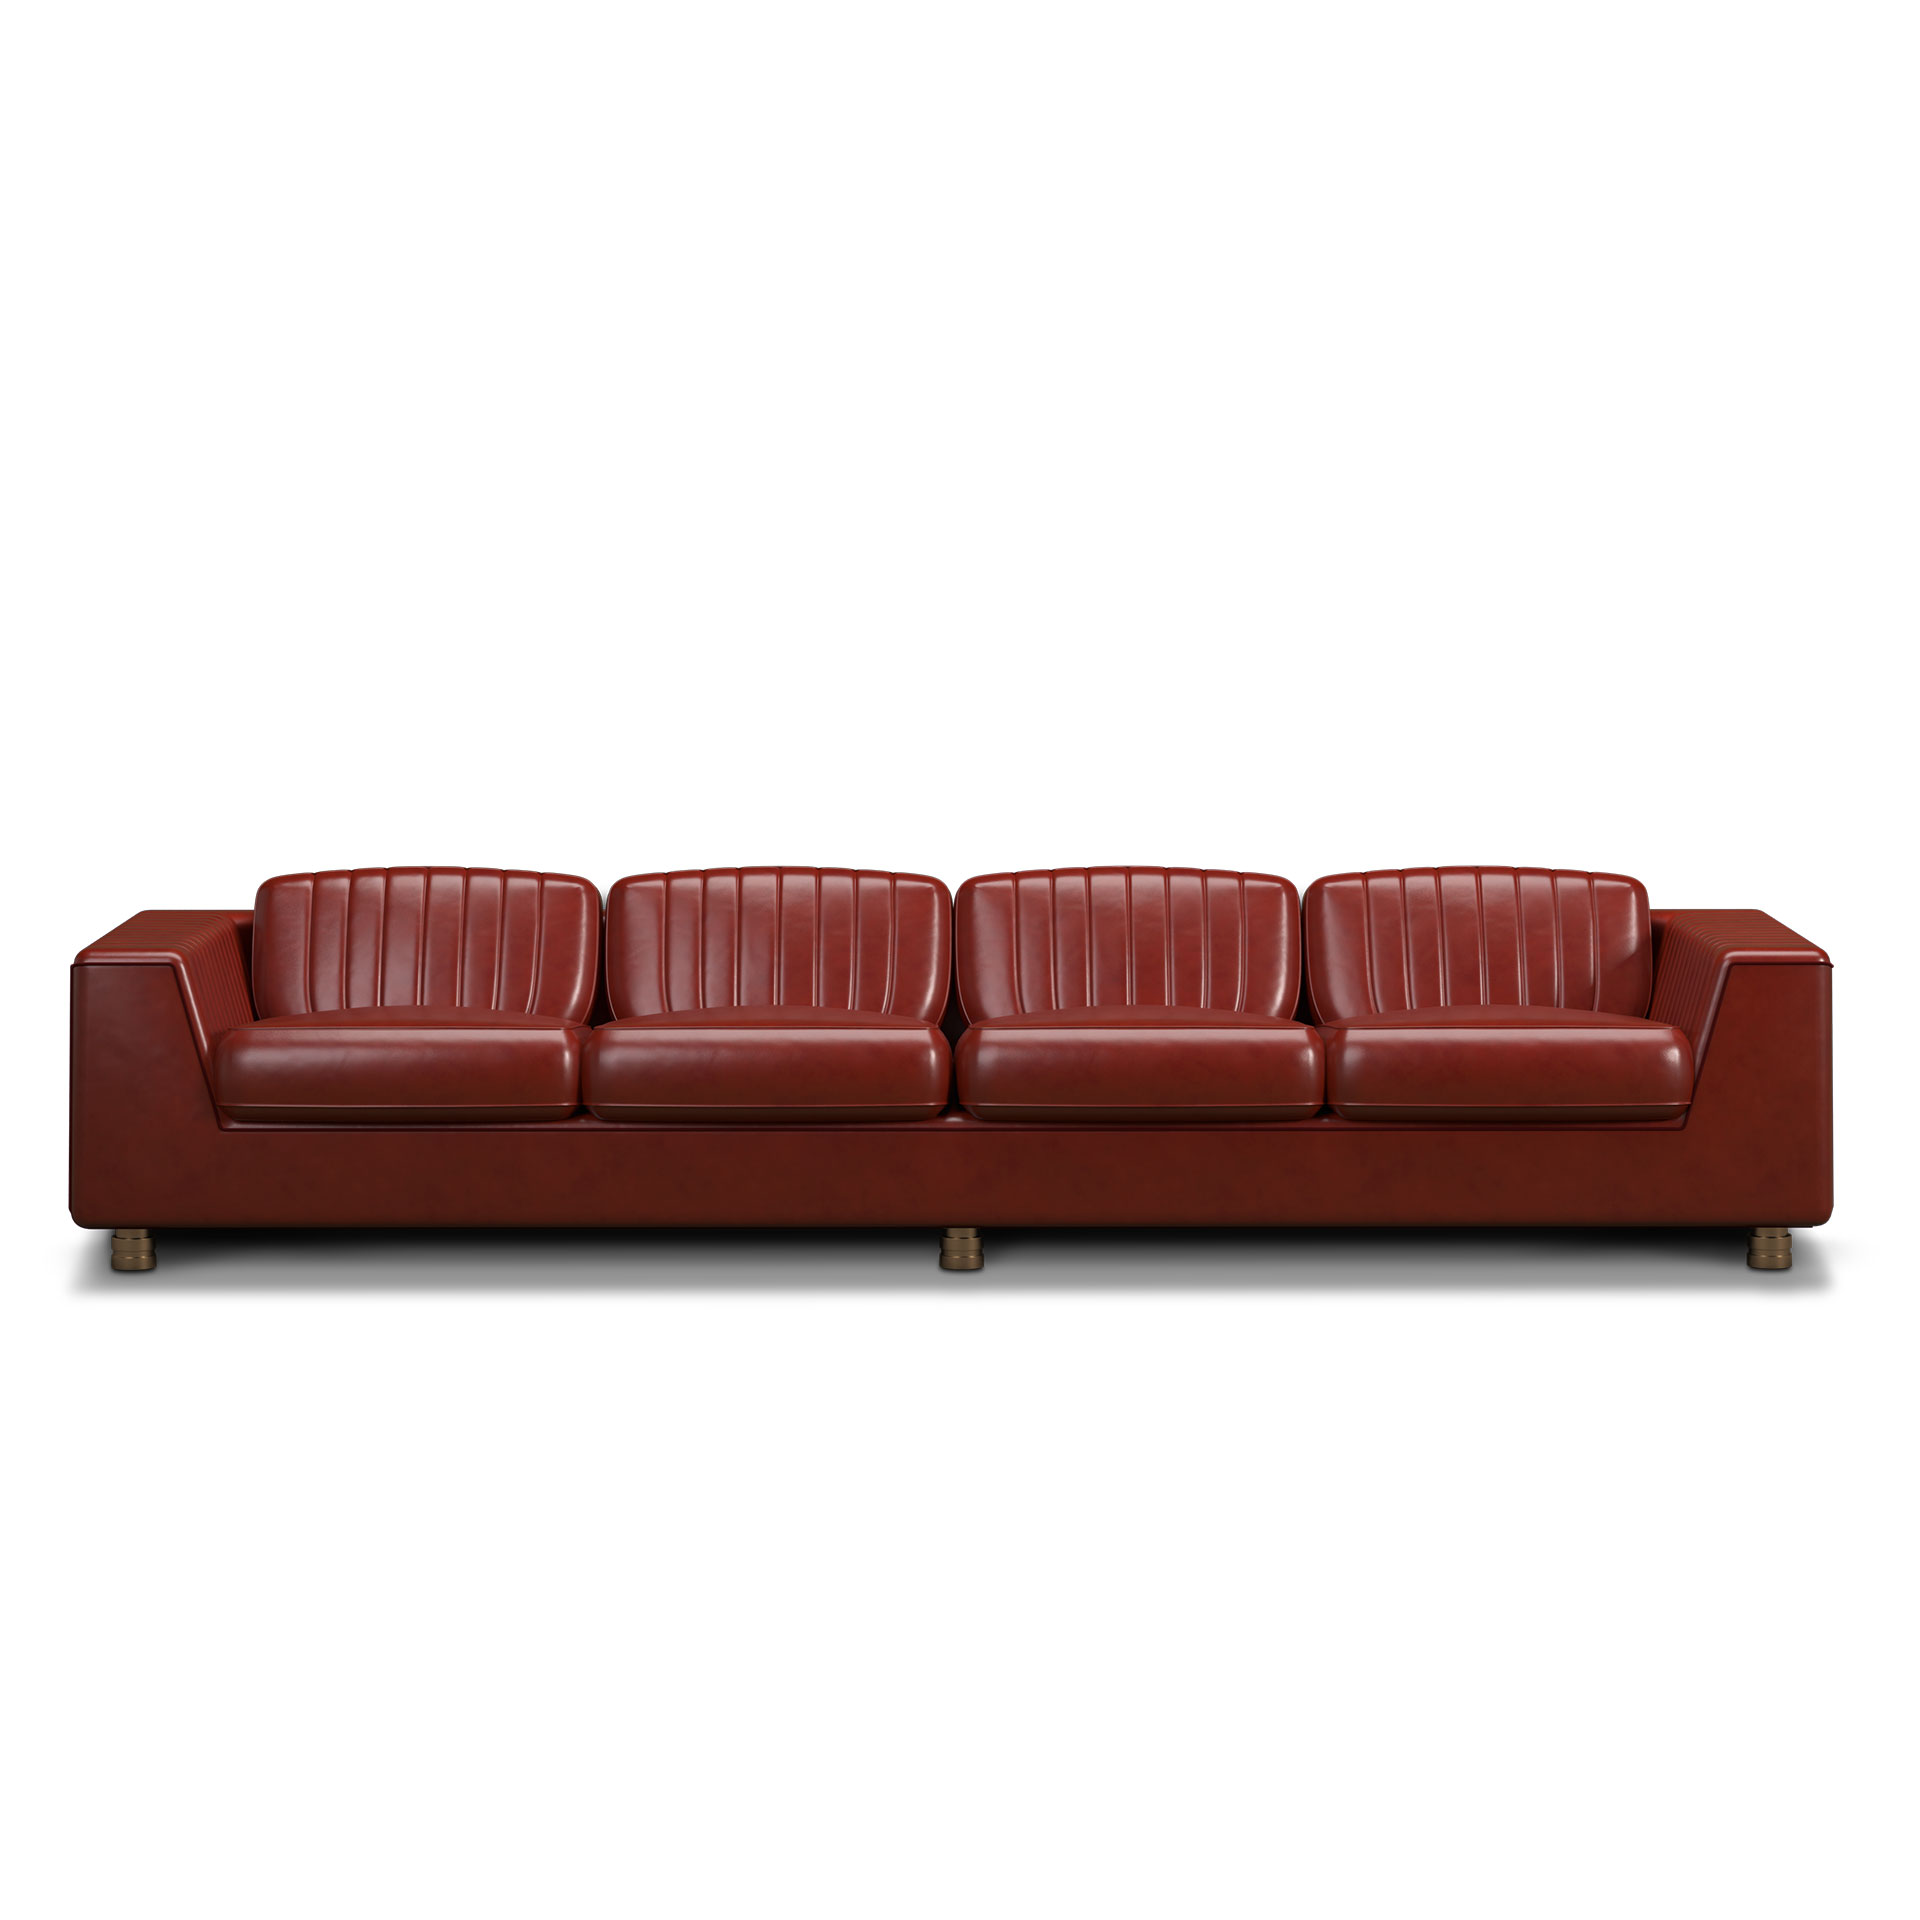 Yosemite sofa